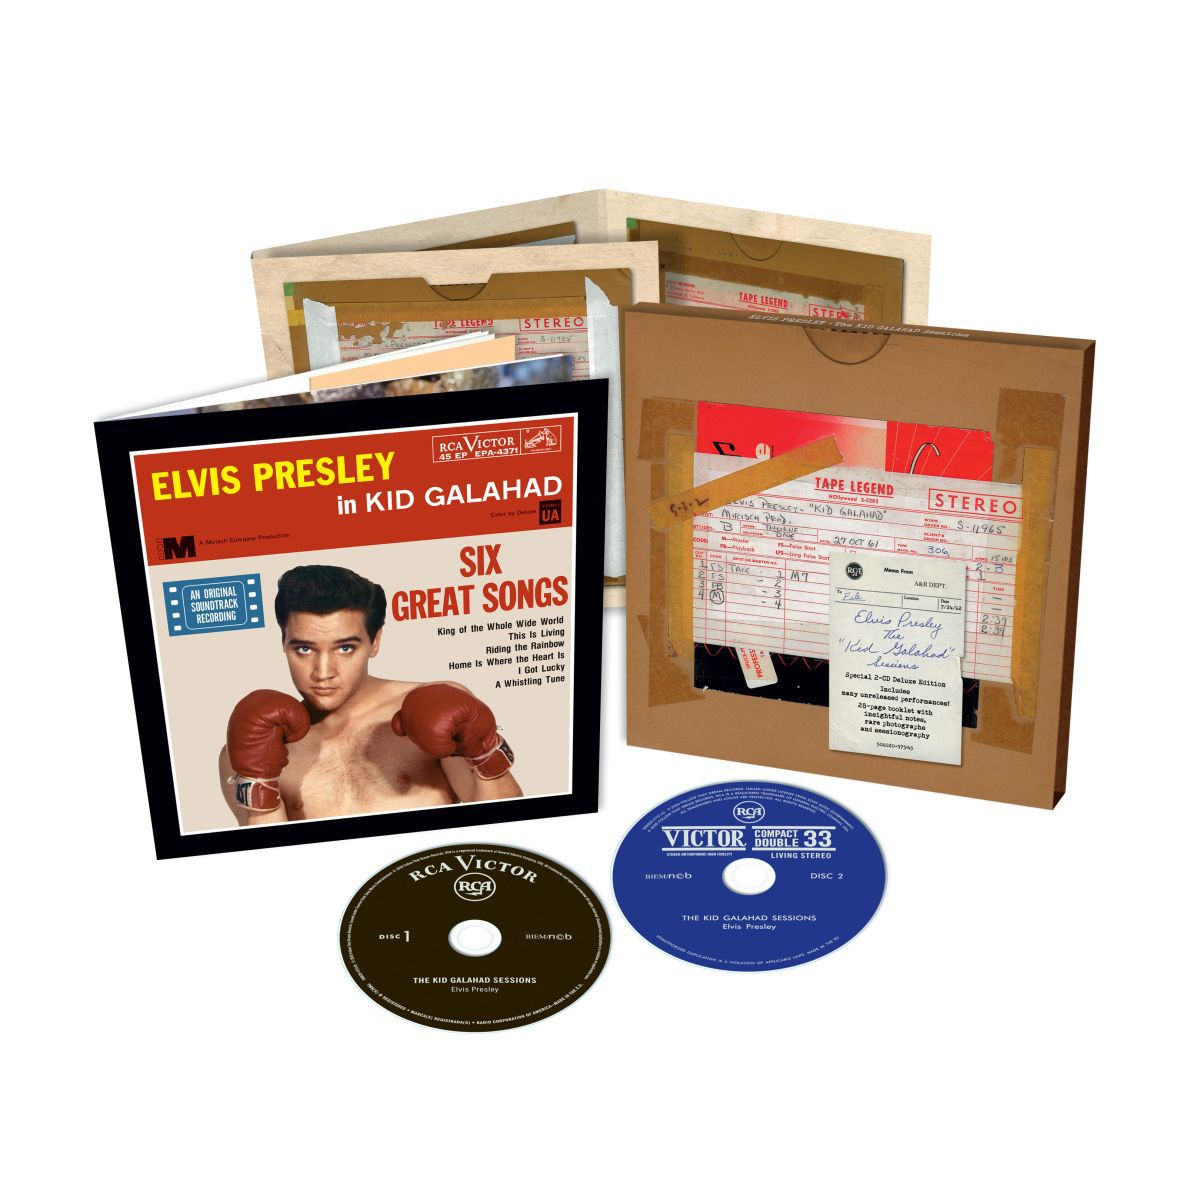 The Kid Galahad Session FTD (2-disc) CD